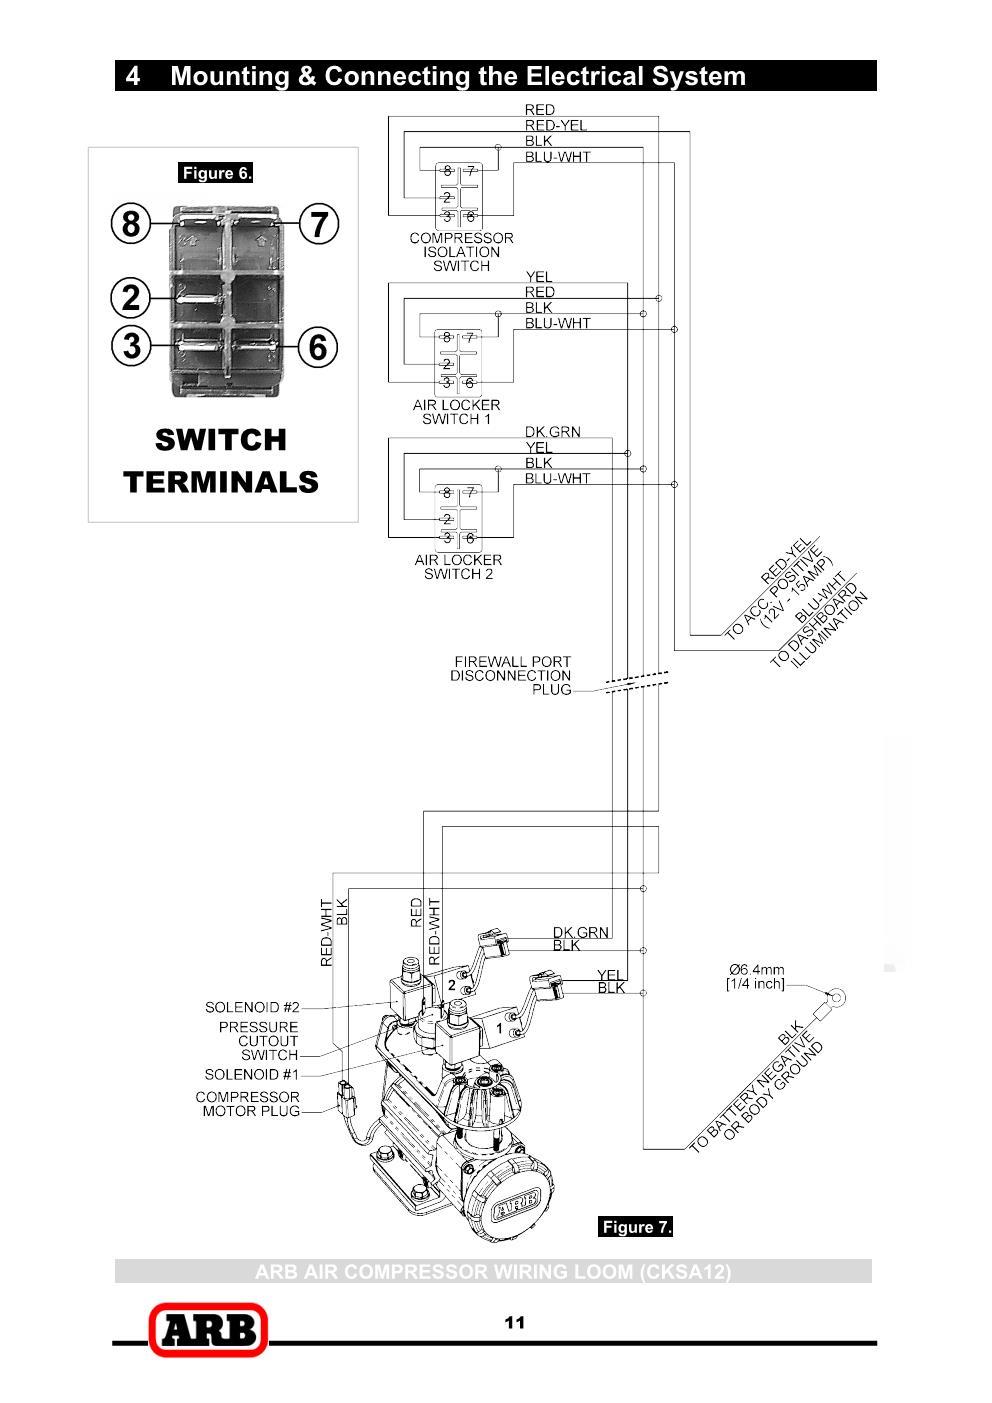 Elocker   Air Locker Wiring Mystery  Help